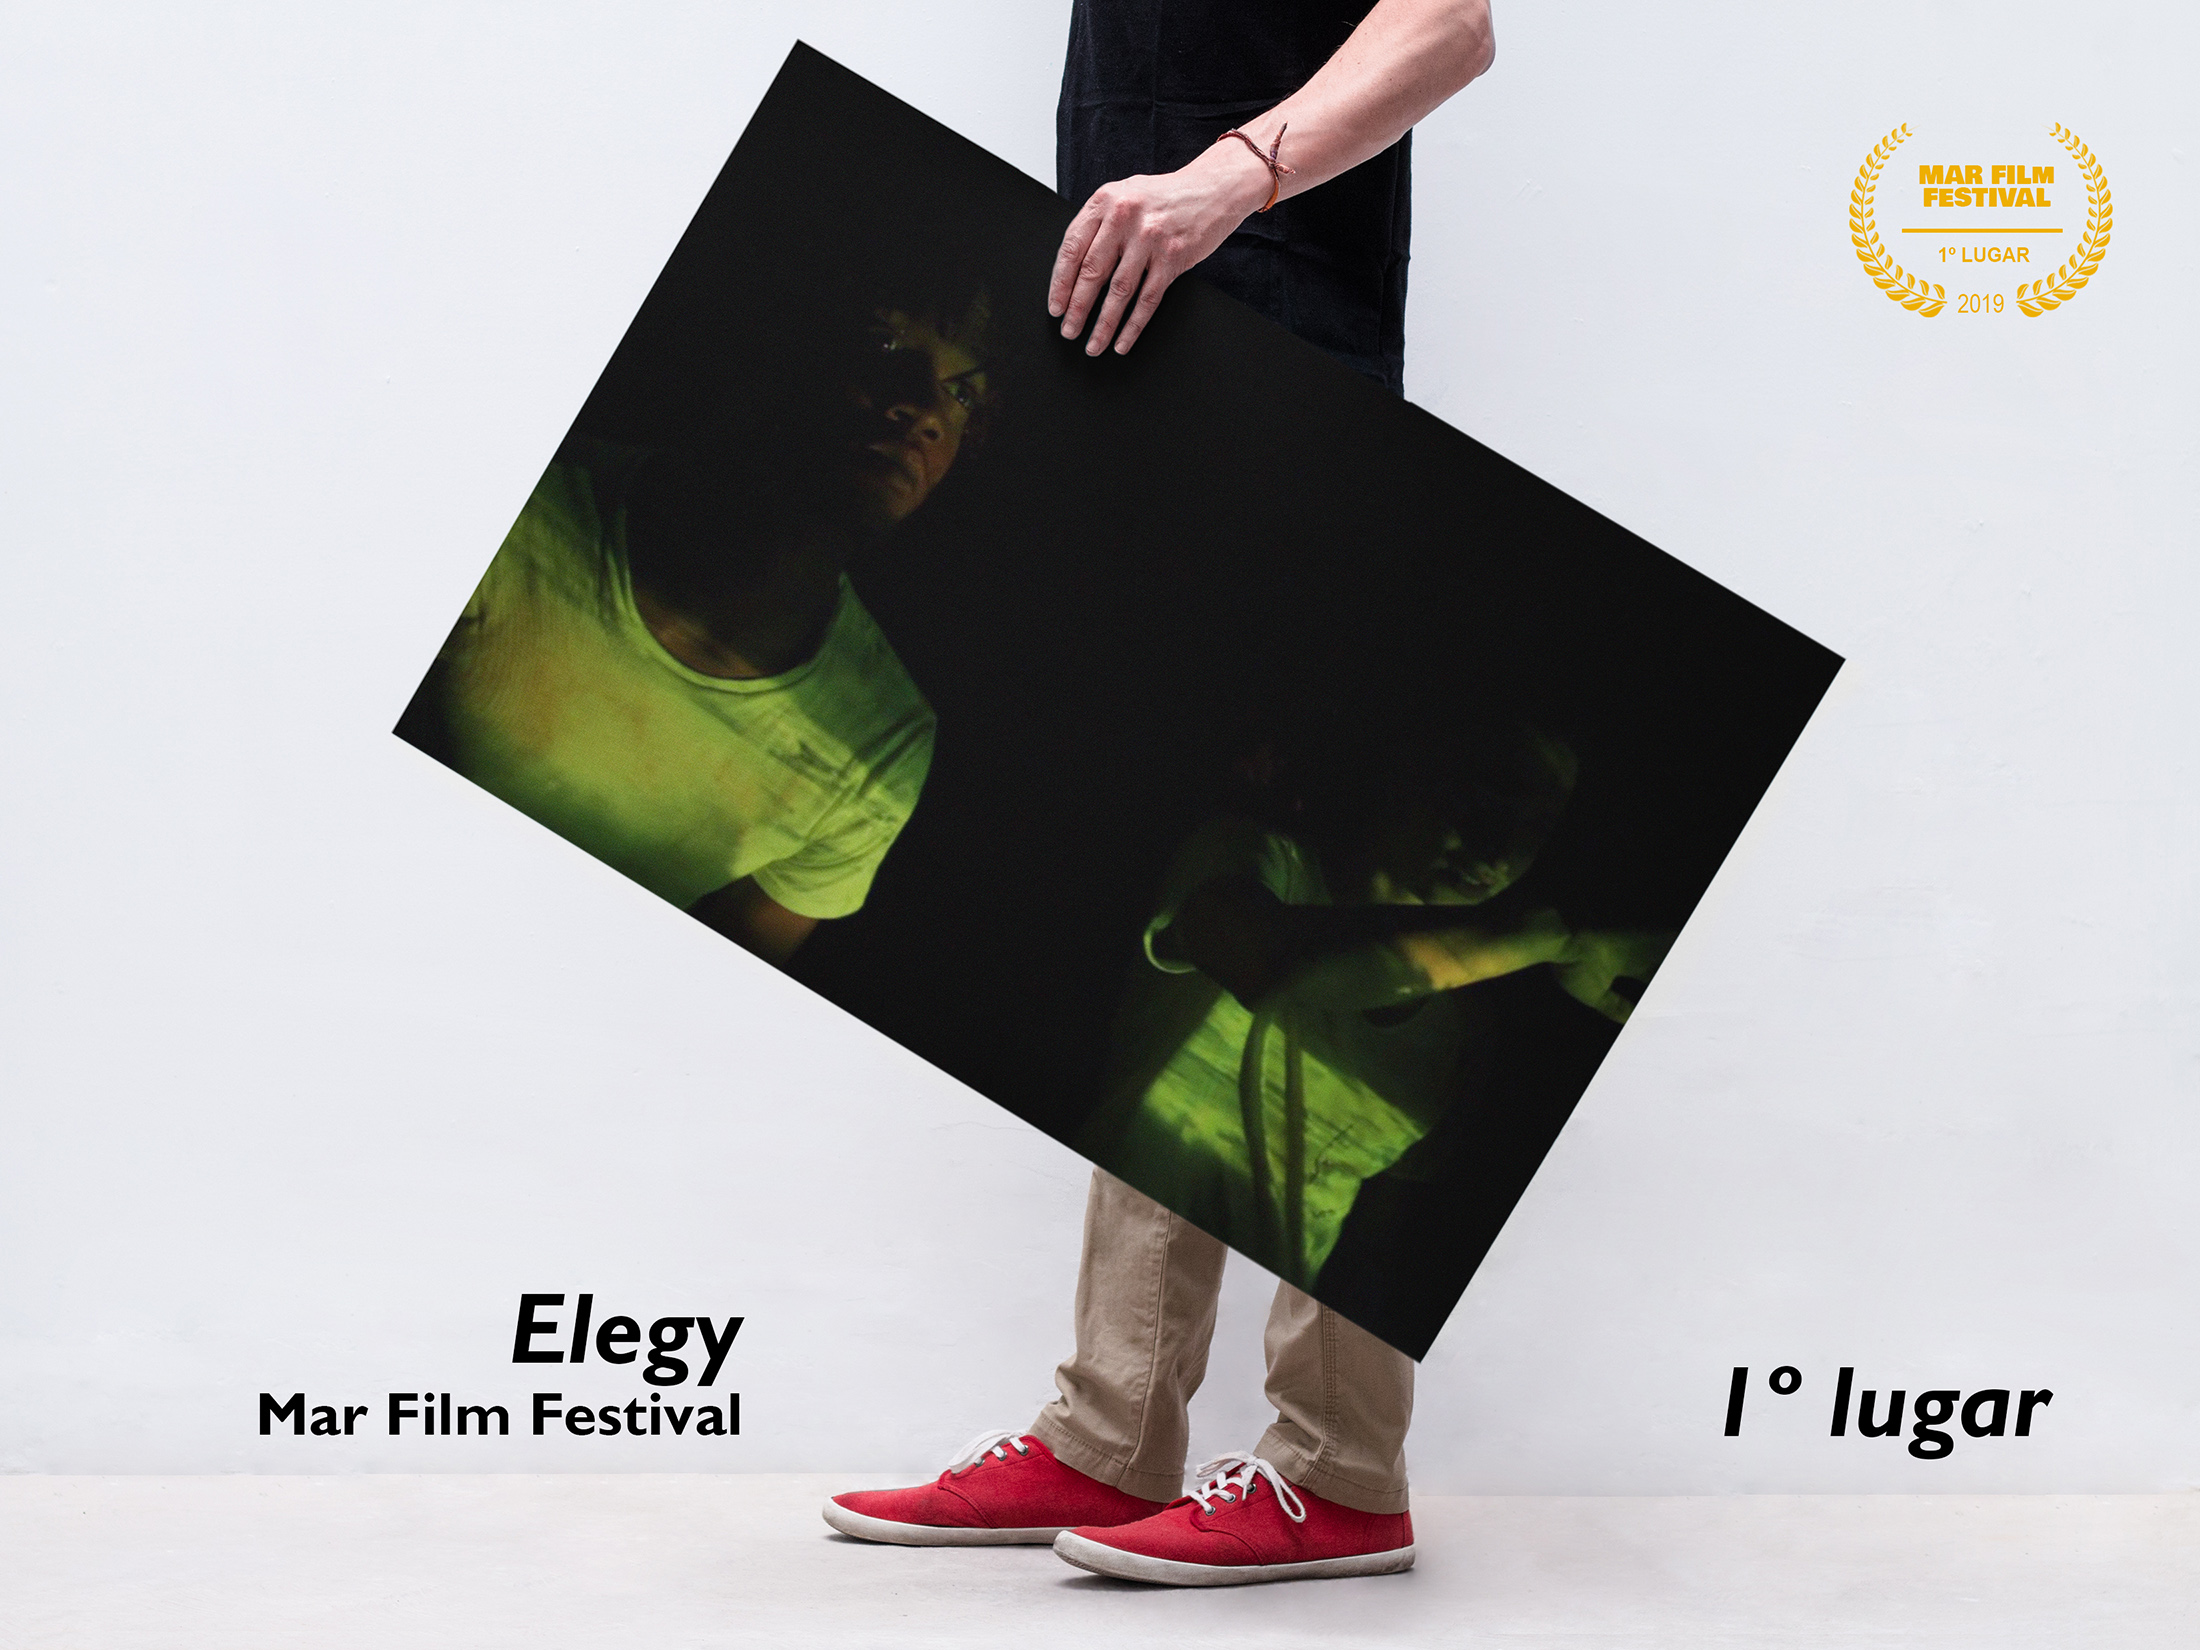 mar film festival